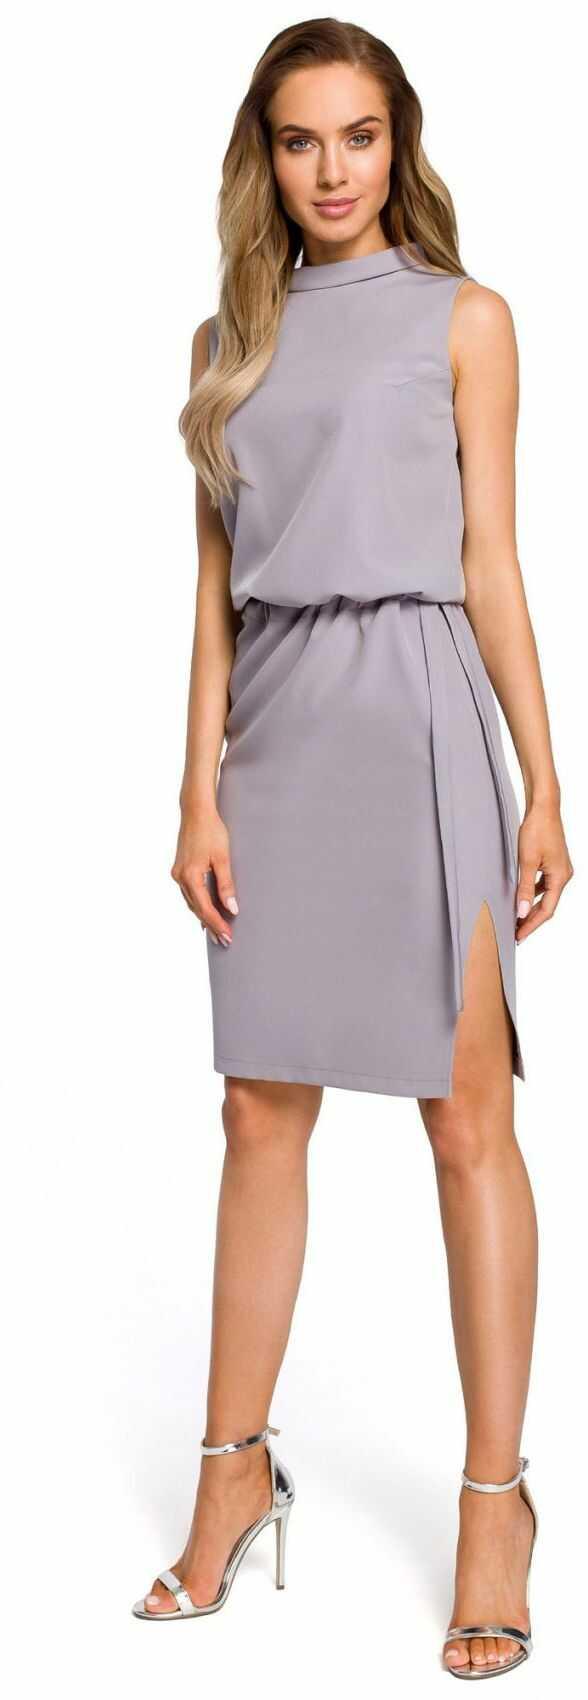 M423 Sukienka z rozpięciem na plecach - szara